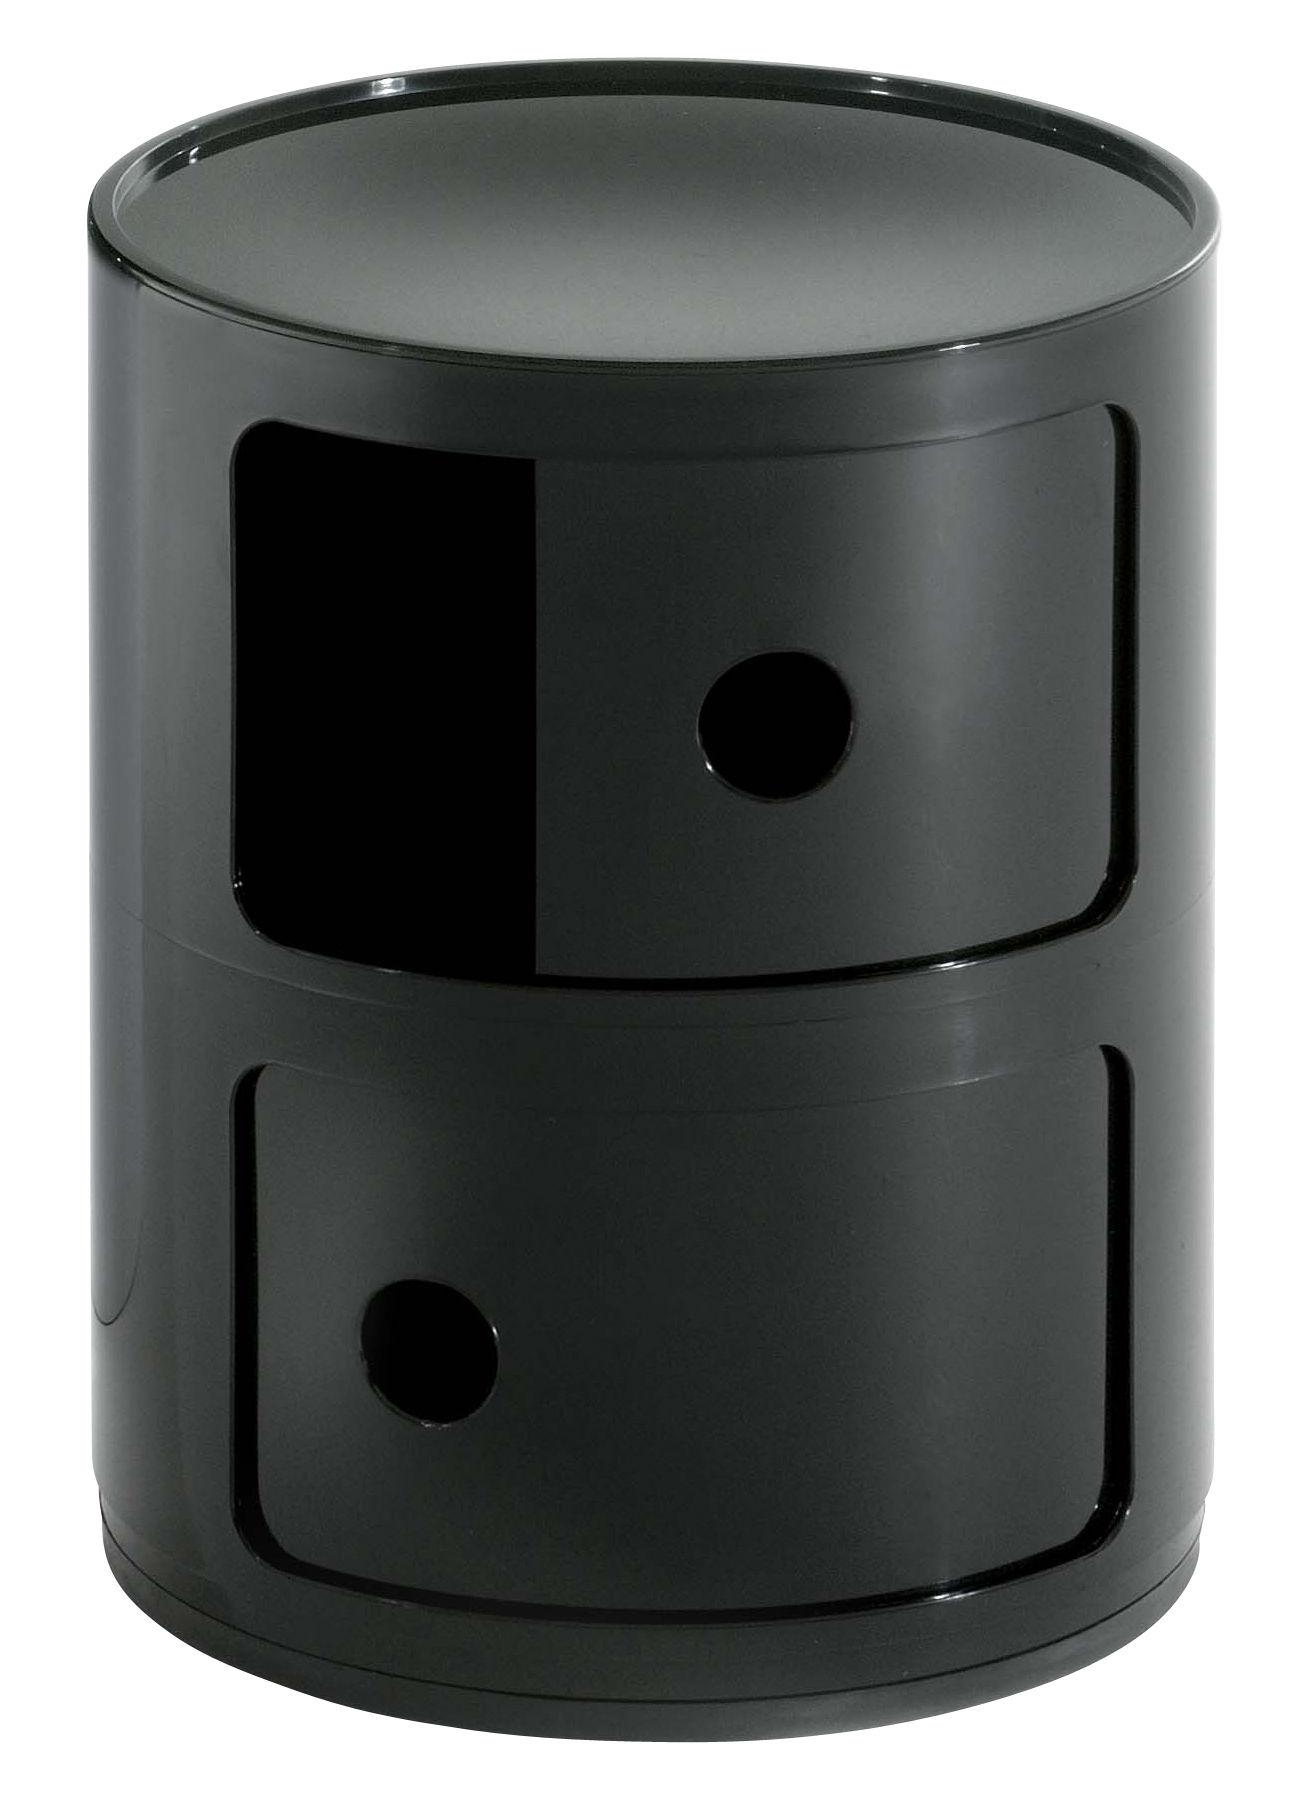 Mobilier - Mobilier Ados - Rangement Componibili / 2 tiroirs - H 40 cm - Kartell - Noir brillant - ABS